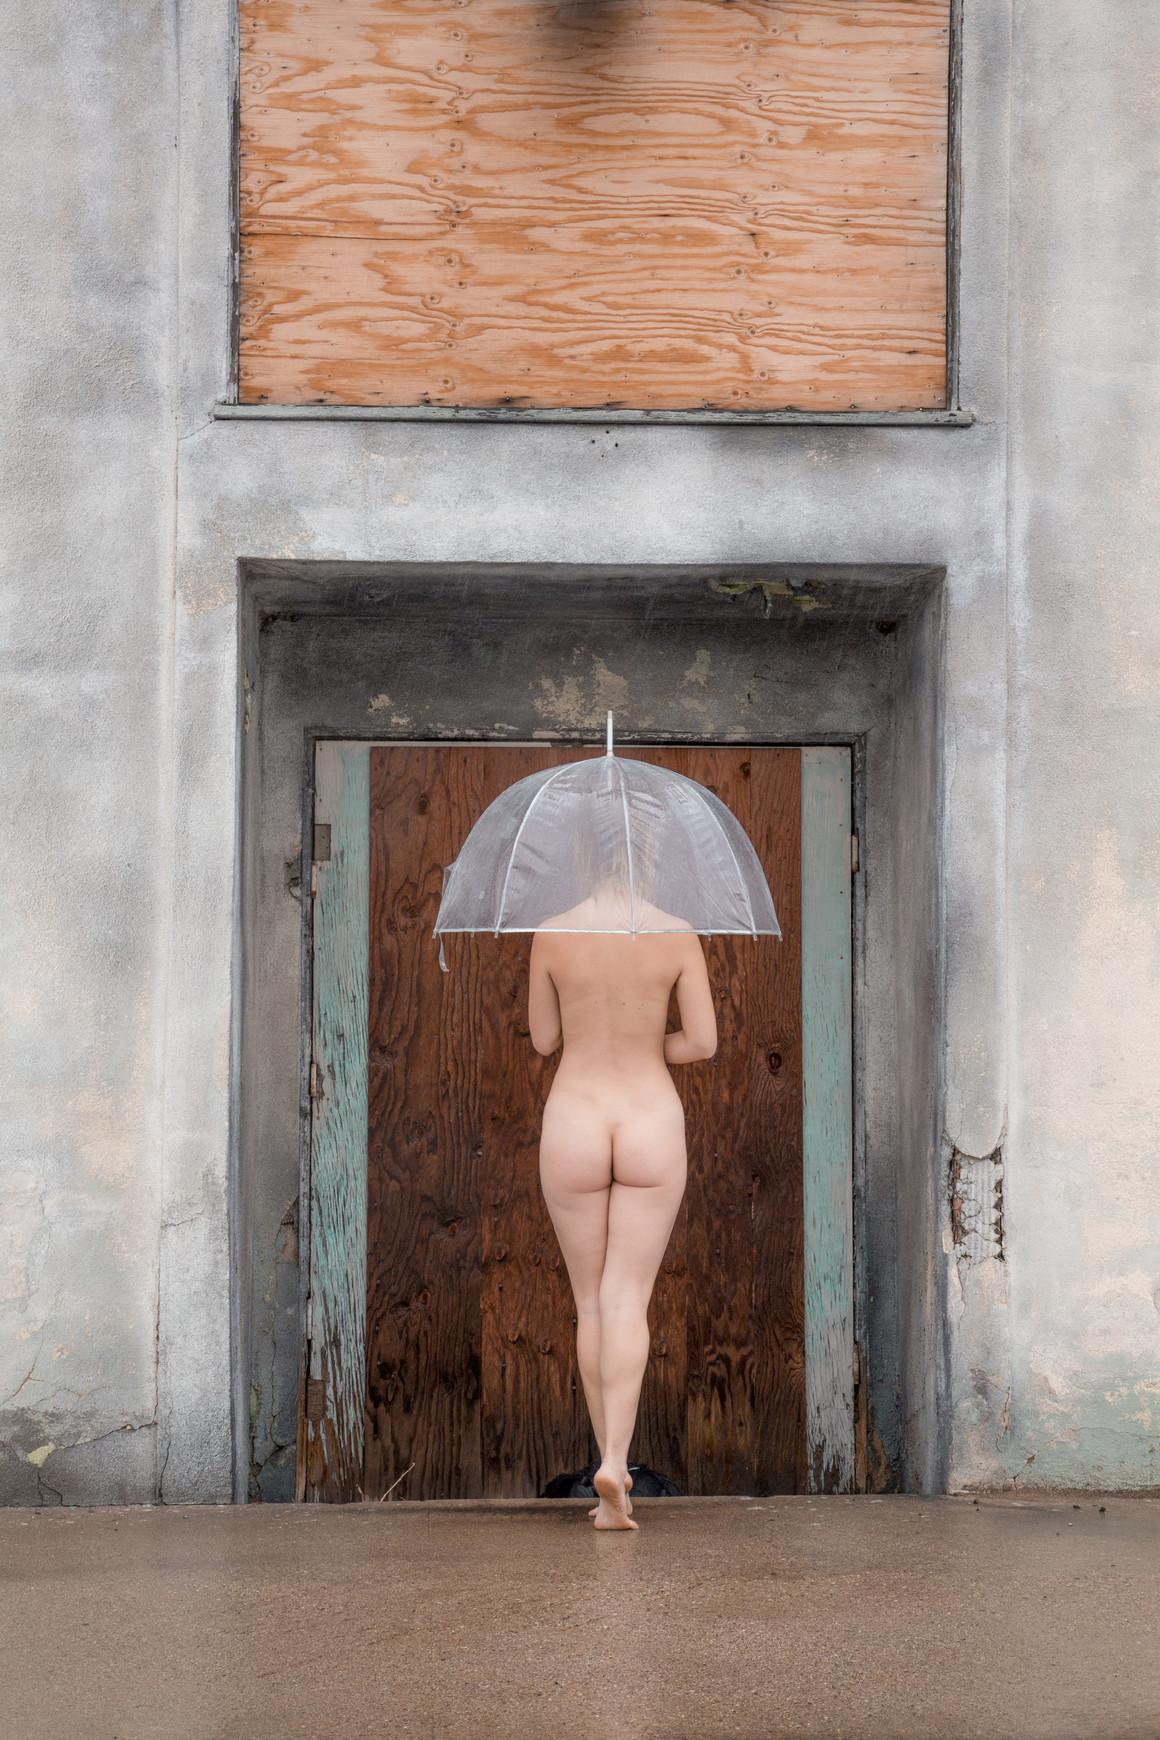 Rainy Days 3